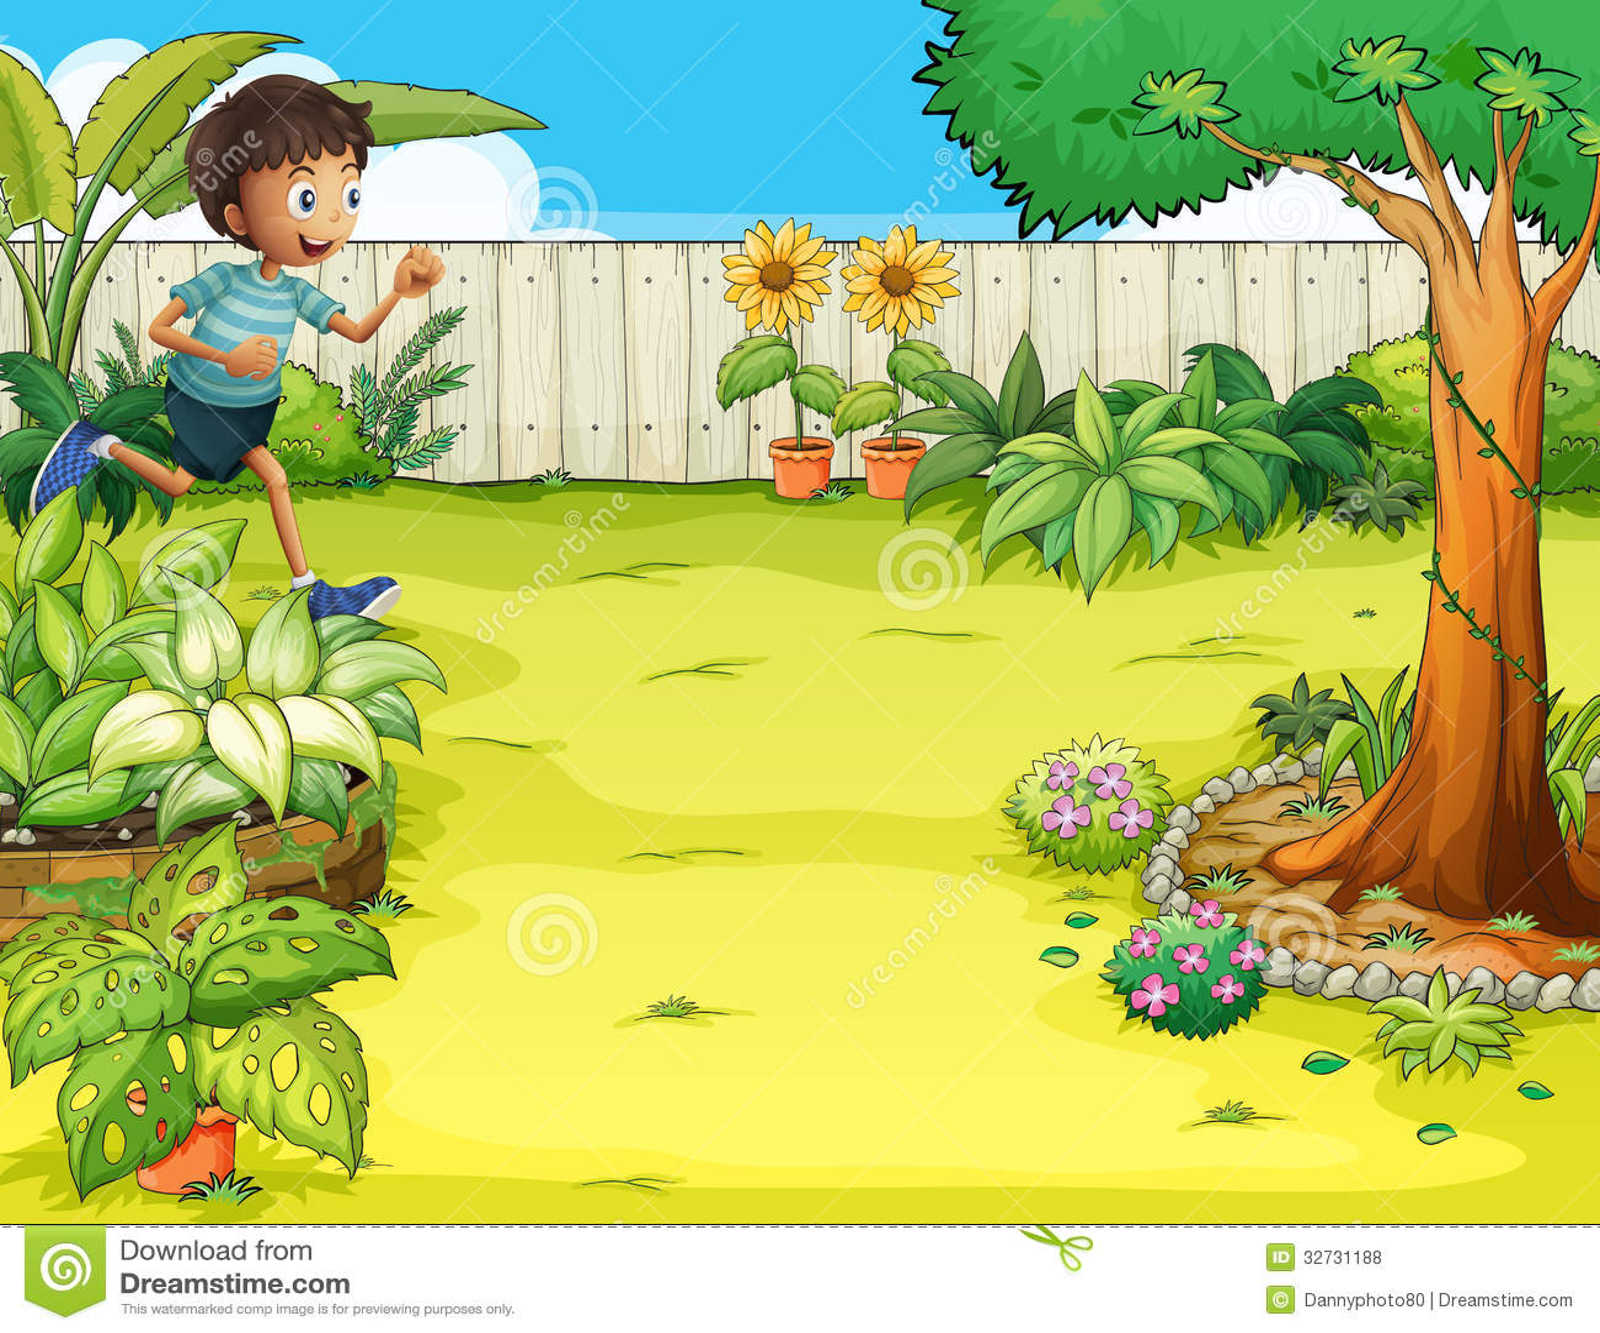 Backyard Design App backyard landscape design ideas Boy Running At The Backyard Royalty Free Stock Photos Image